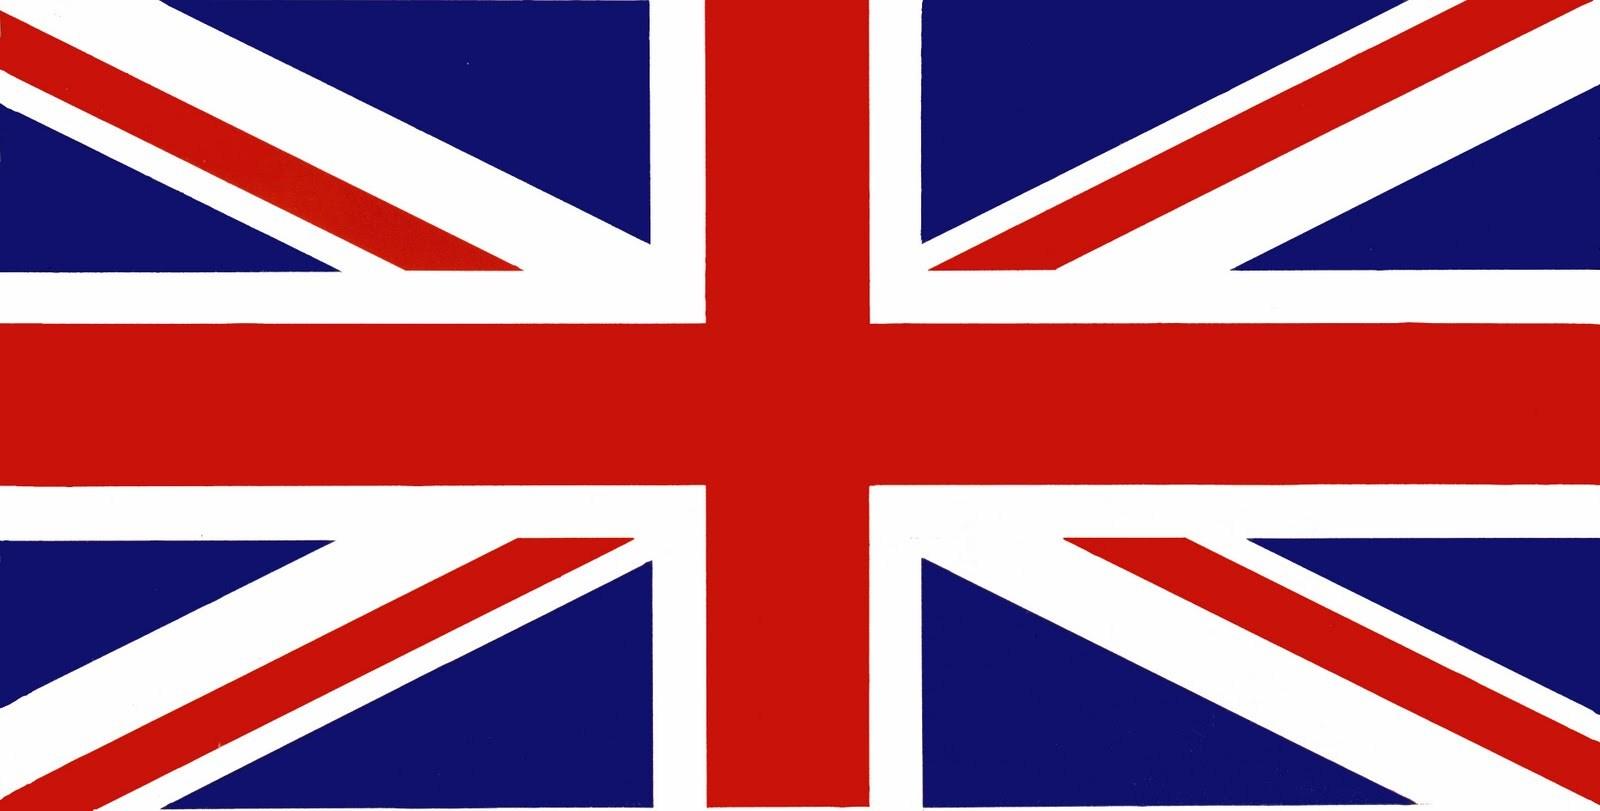 Union flag images clipart vector freeuse Union flag clipart 2 » Clipart Portal vector freeuse